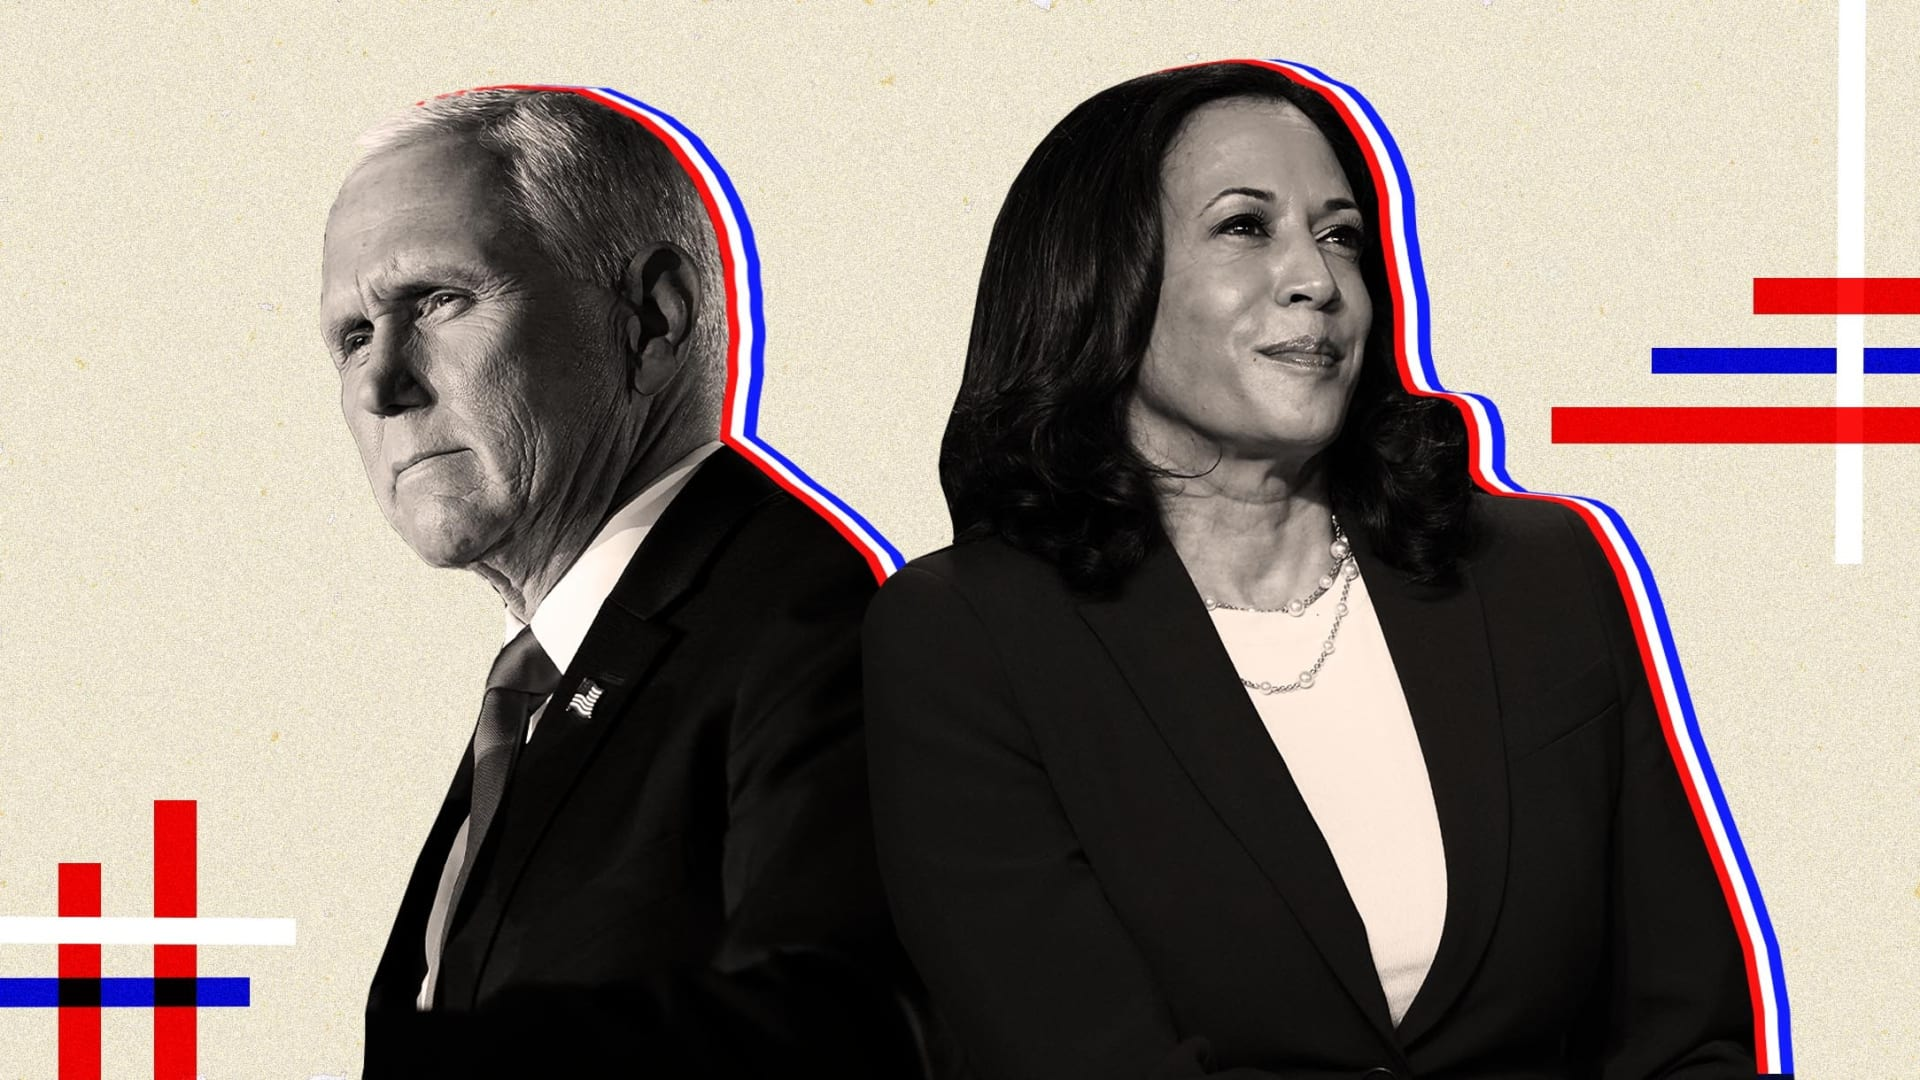 Pence v. Harris: A Rare Vice Presidential Debate That Matters